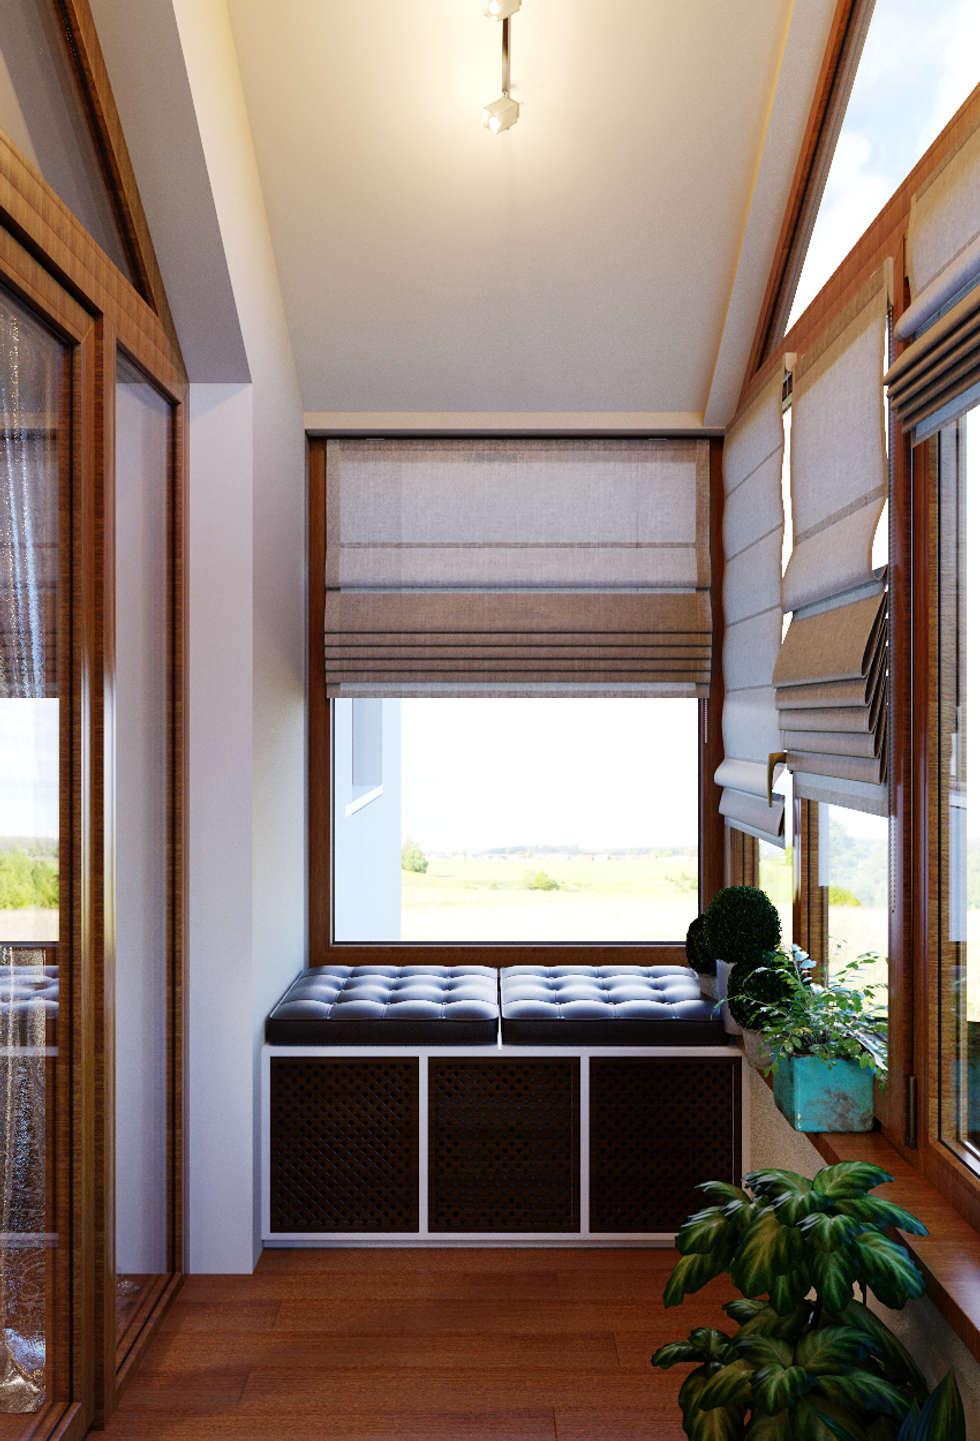 Fotos de terracos por студия дизайна interior design ideas h.